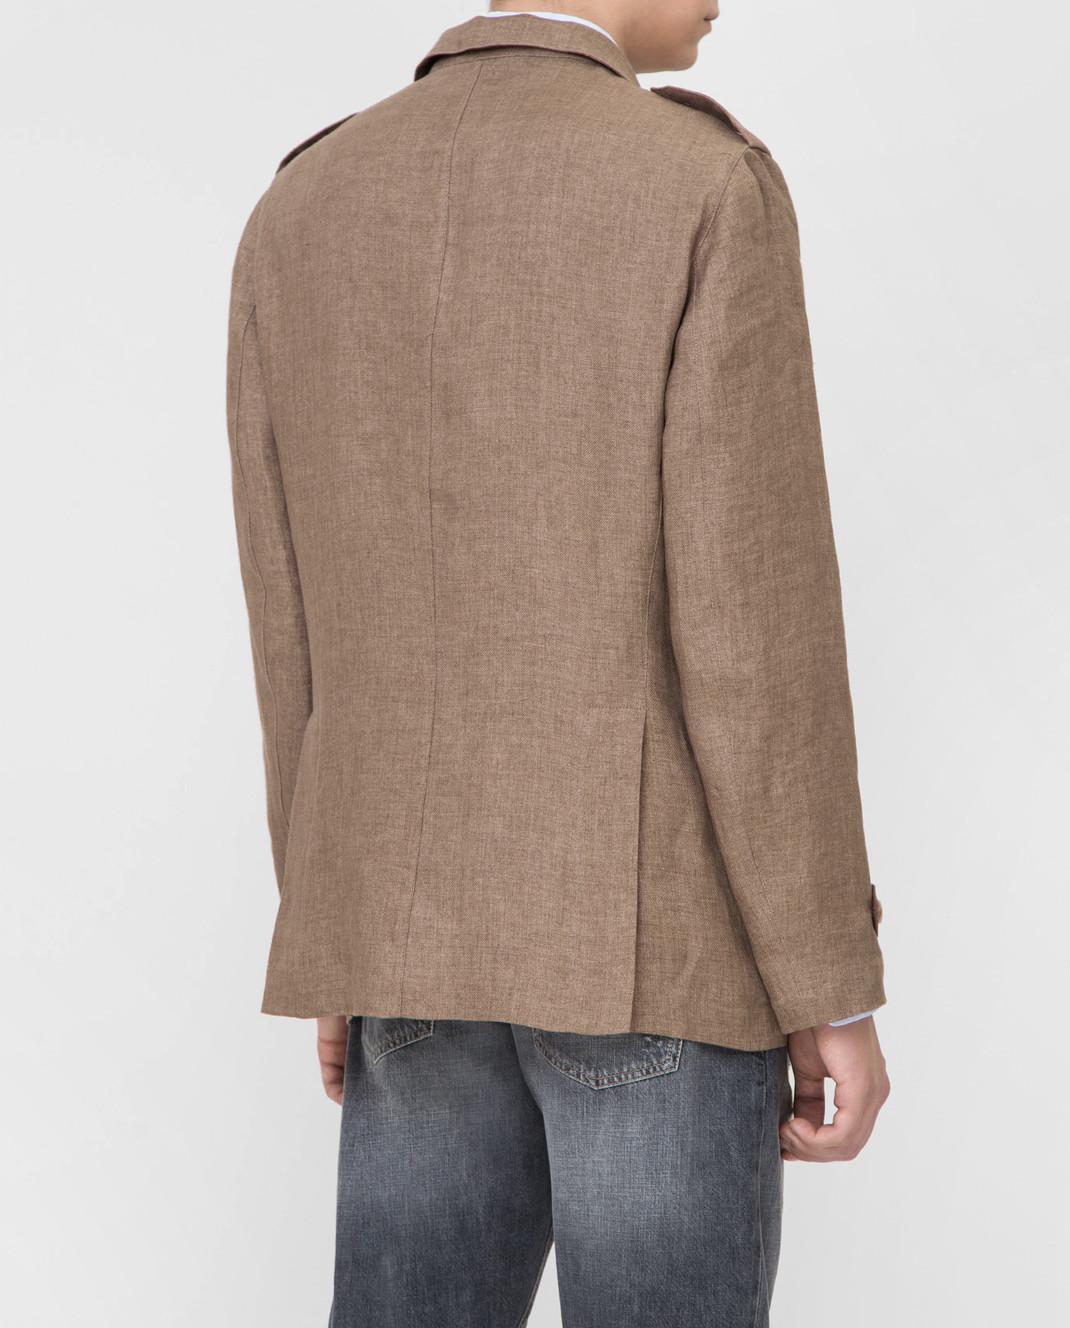 Brunello Cucinelli Коричневая куртка MD4176849 изображение 4